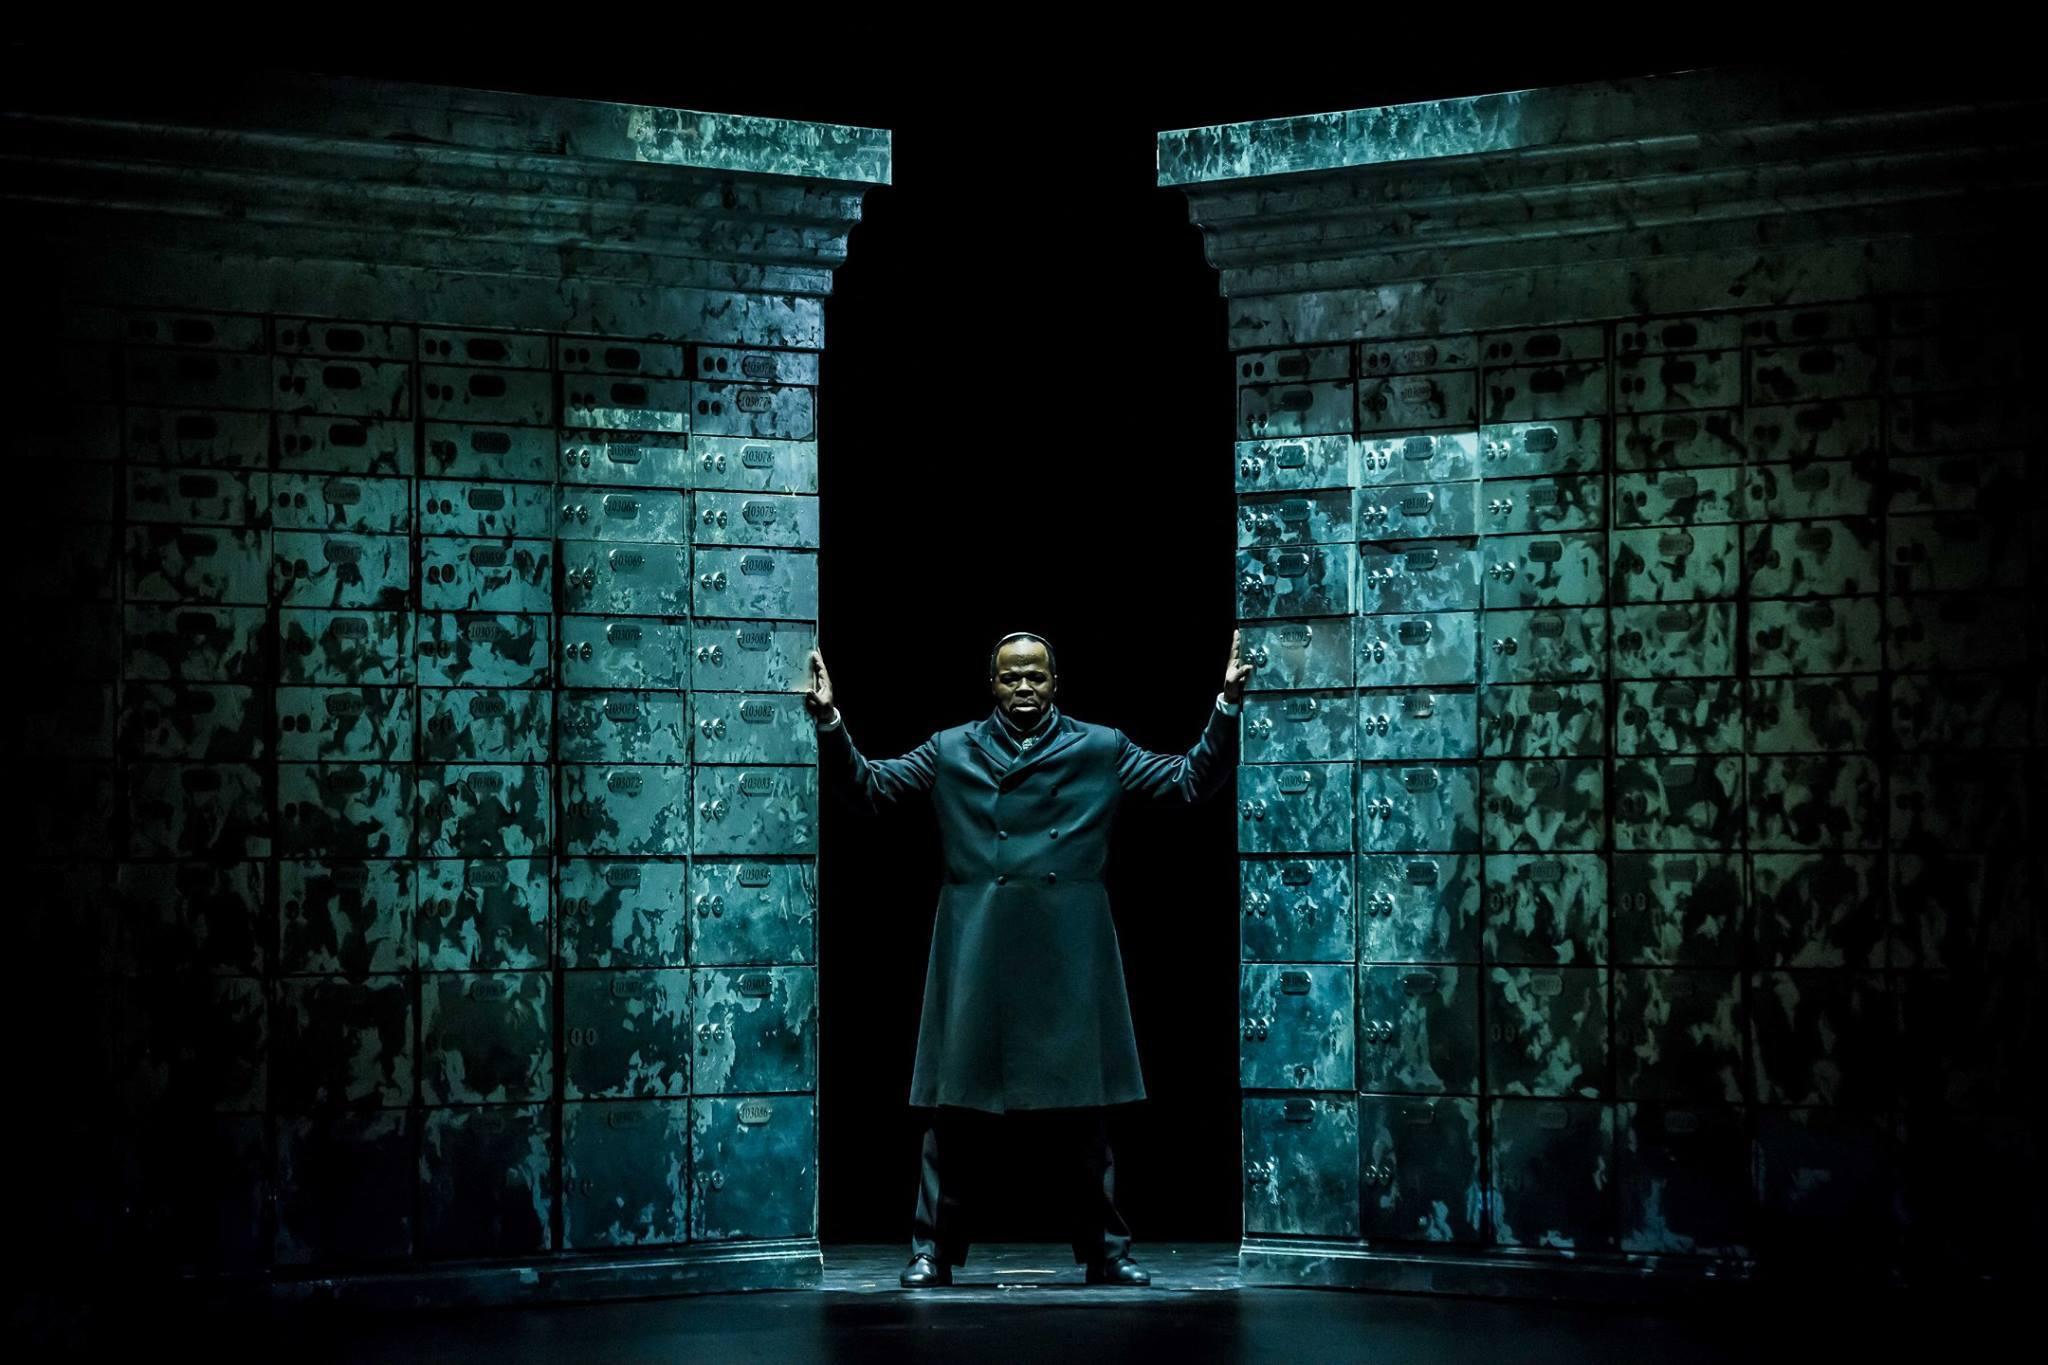 Shylock - A. Tchaikowsky's Merchant of Venice